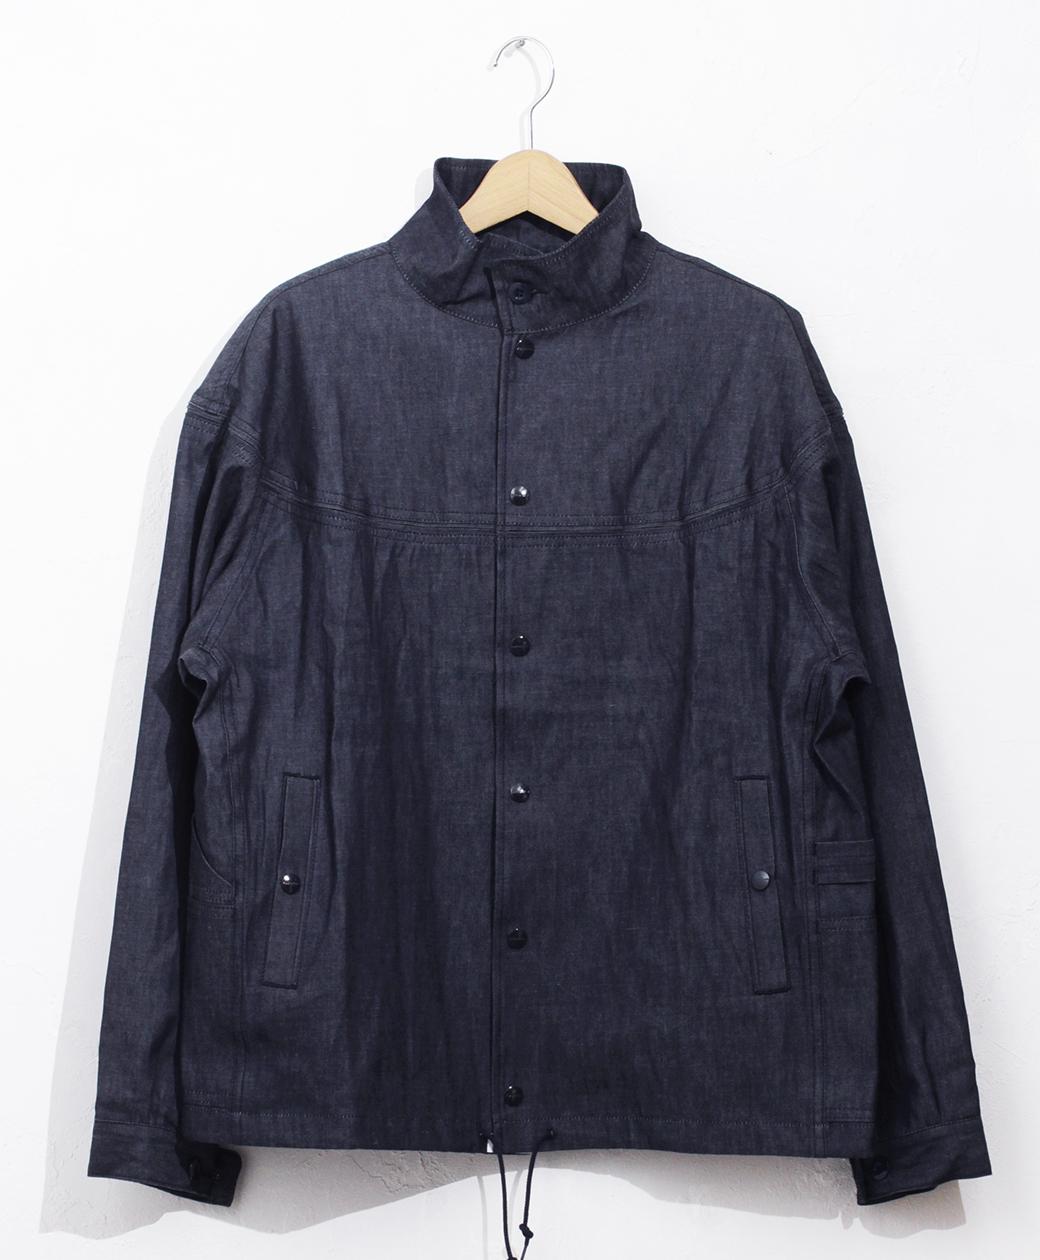 SASSAFRAS Gardener Cap Jacket(6oz Denim)